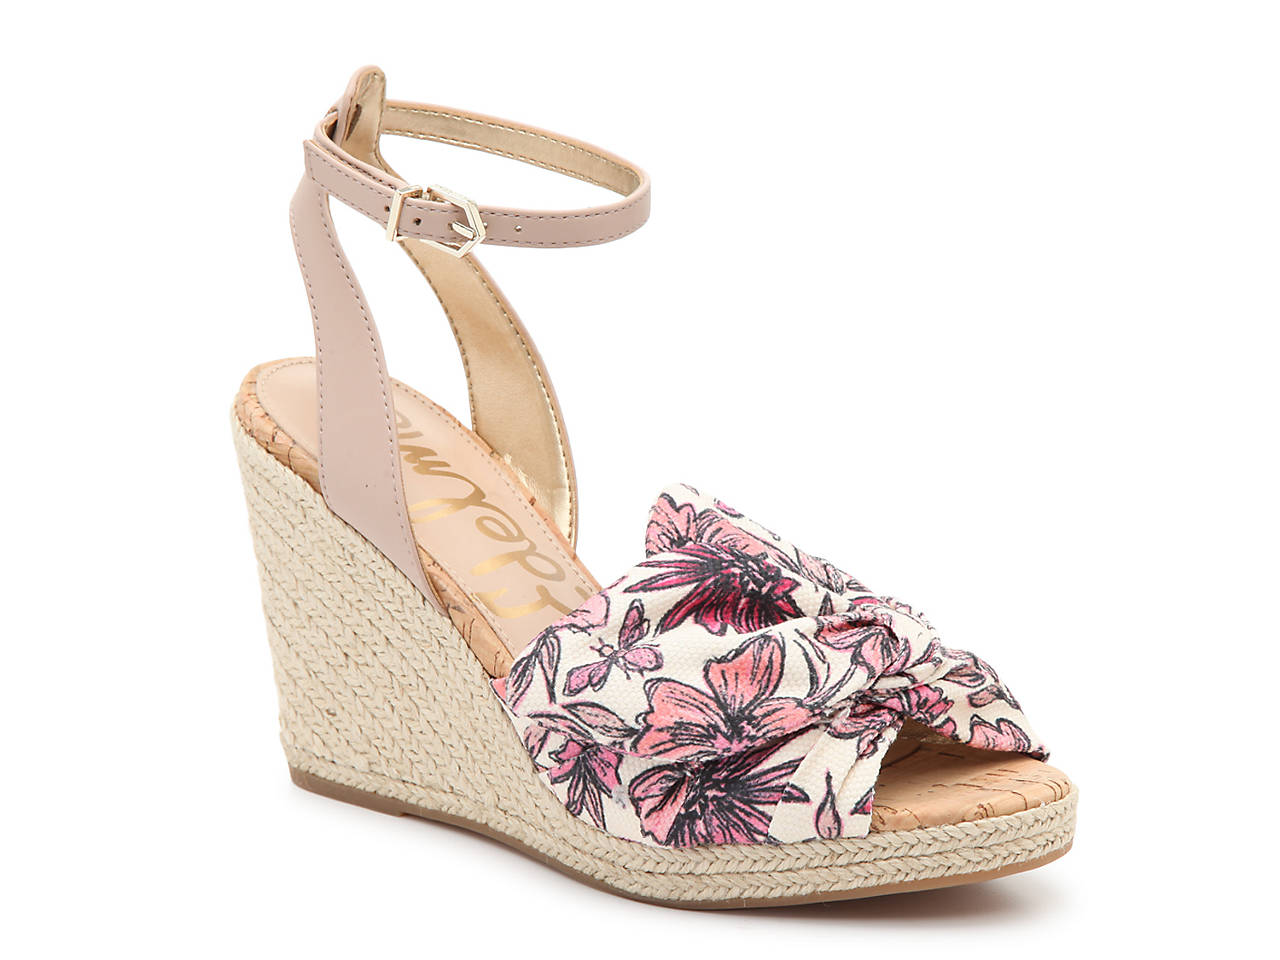 8ccdda4c801fd Sam Edelman Aubrey Wedge Sandal Women s Shoes